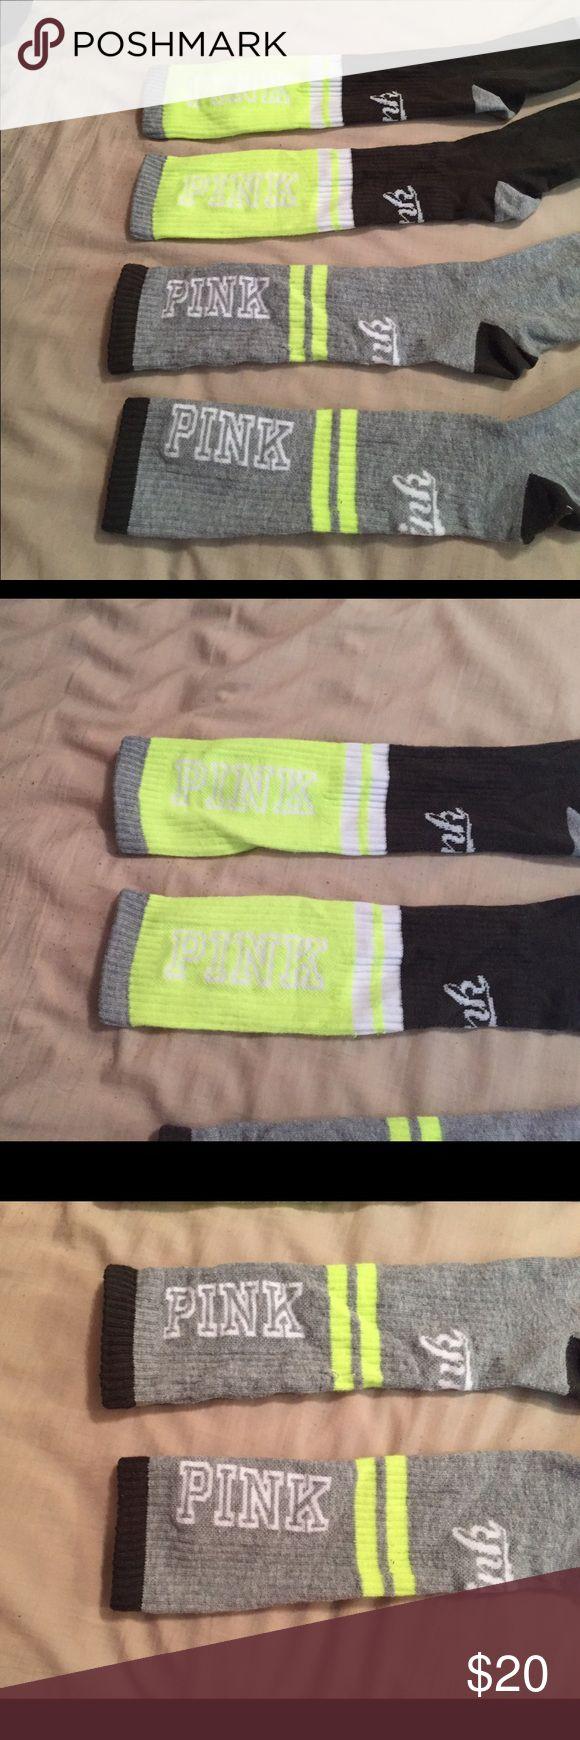 Victoria's Secret PINK ankle high socks Pair of calf high Victoria's Secret PINK socks. Lime green, army green, & gray. PINK Victoria's Secret Accessories Hosiery & Socks